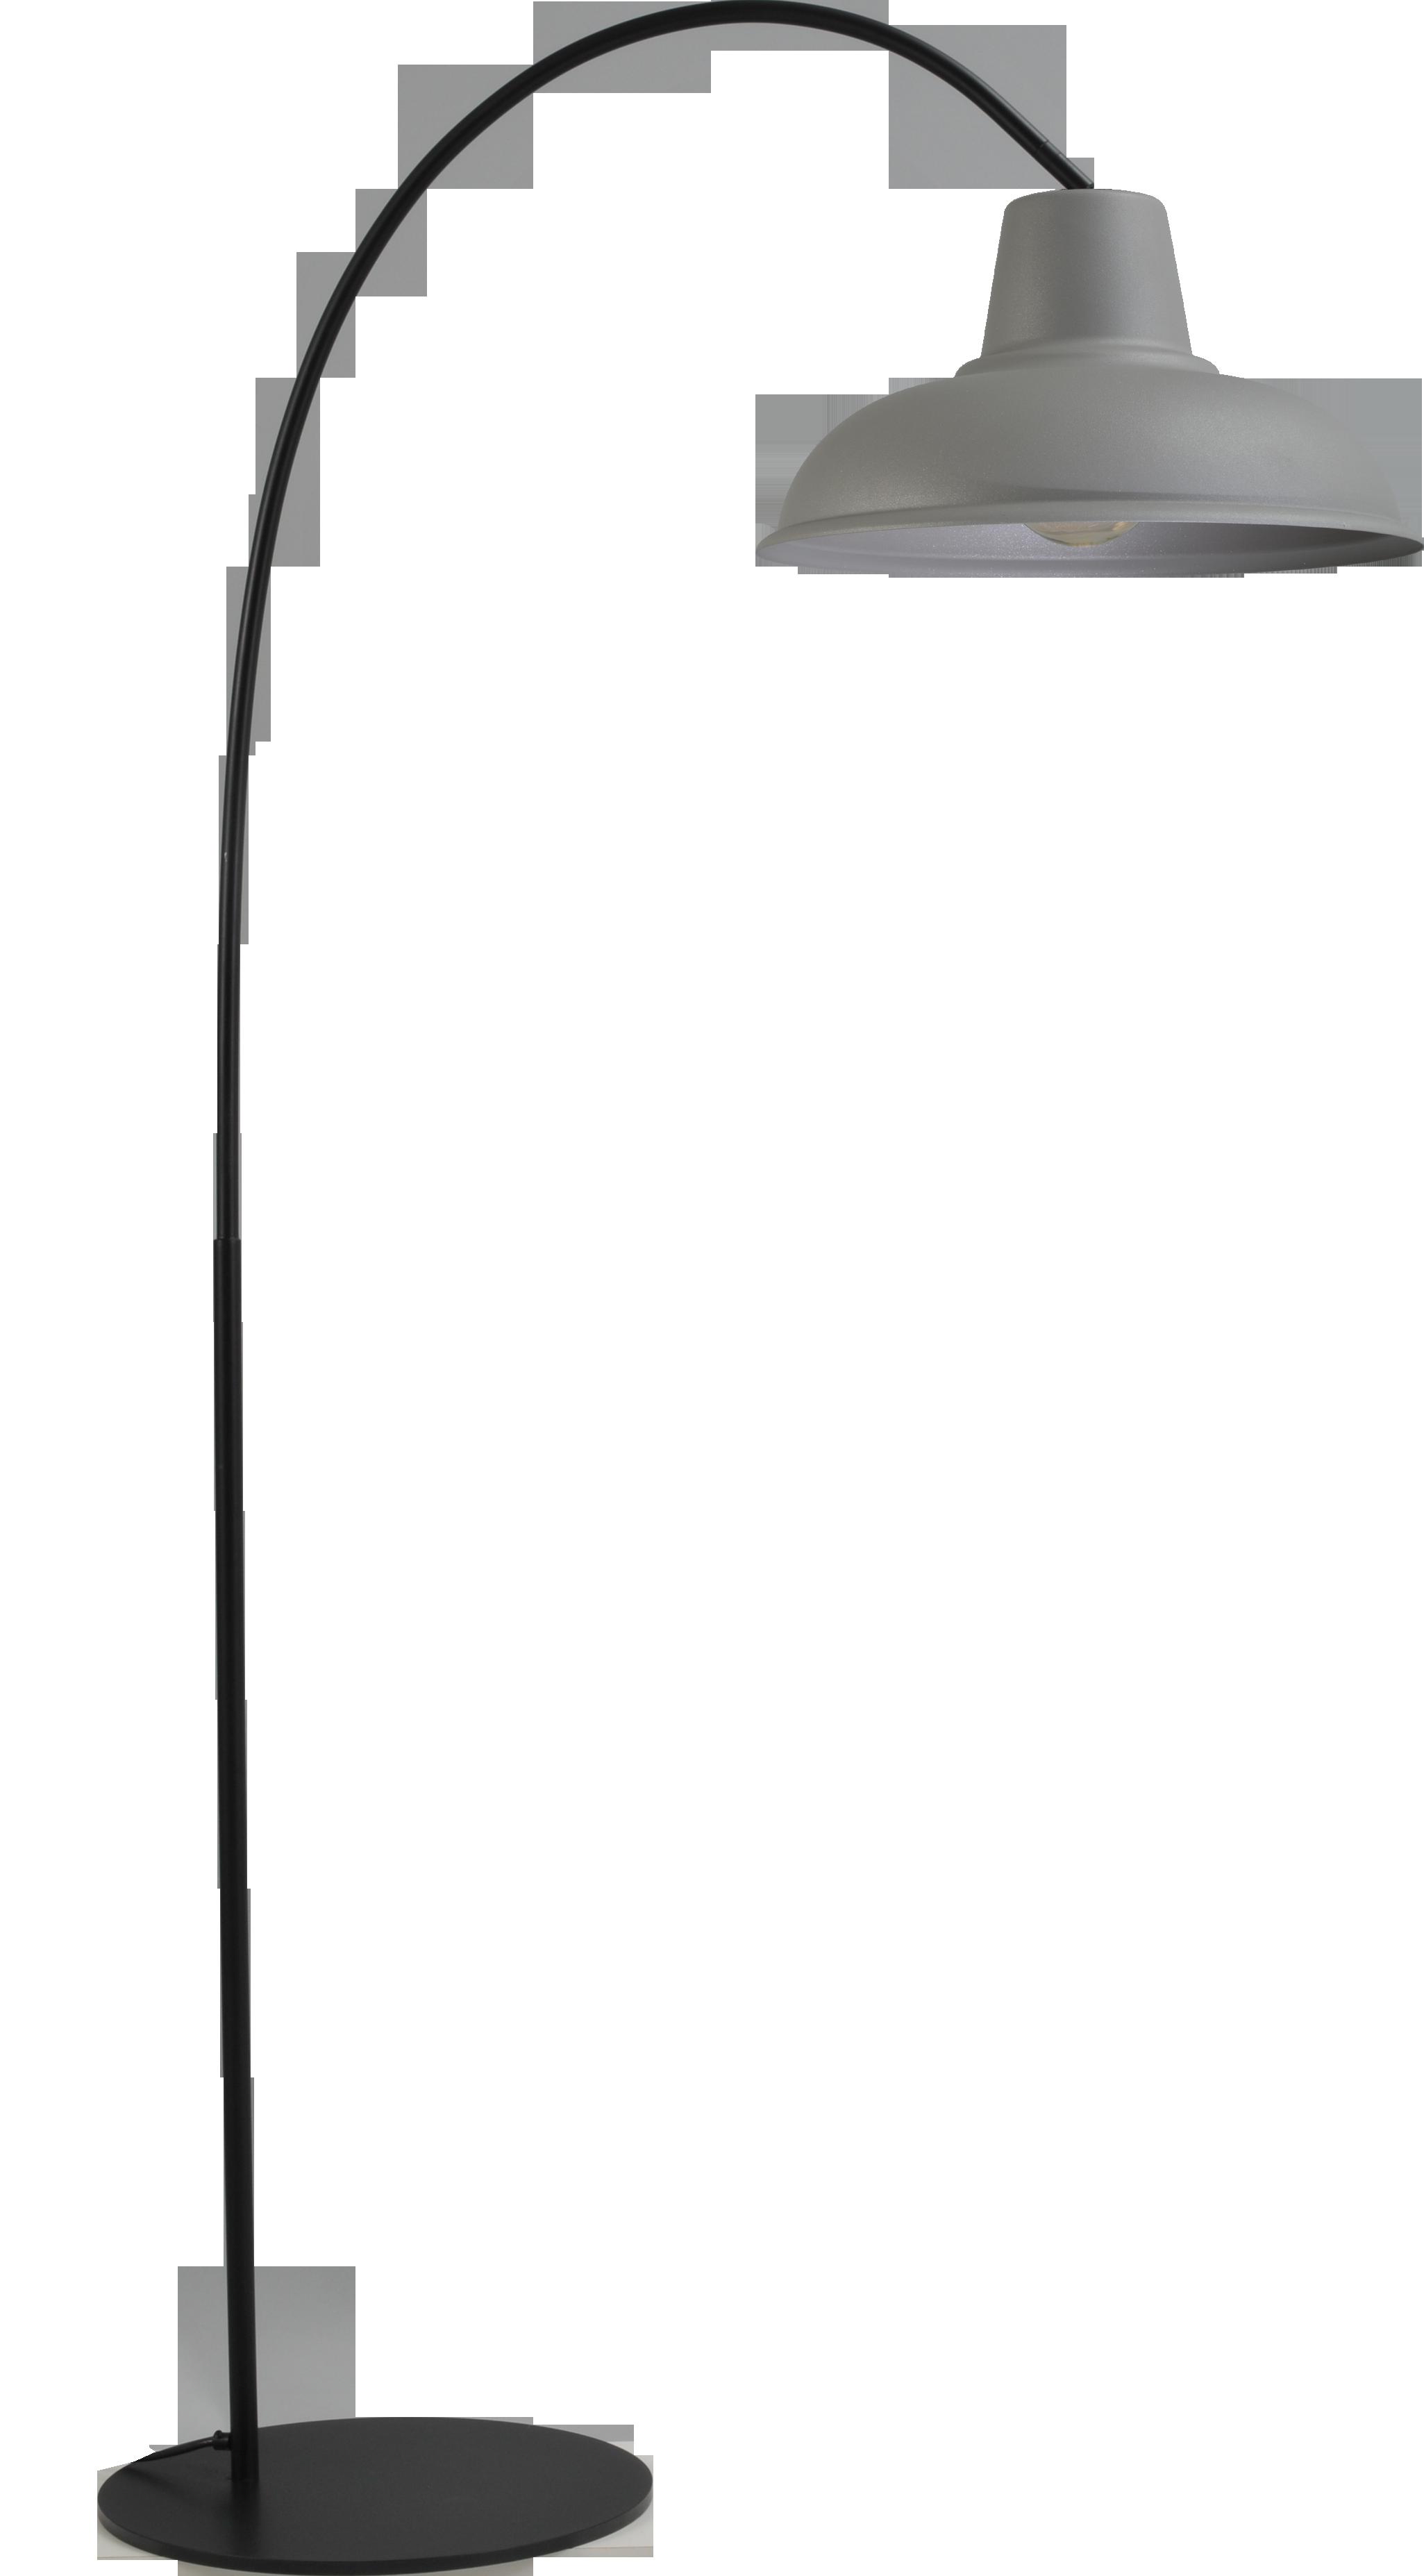 Di Panna VL DI PANNA ARCH BLACK H.186CM